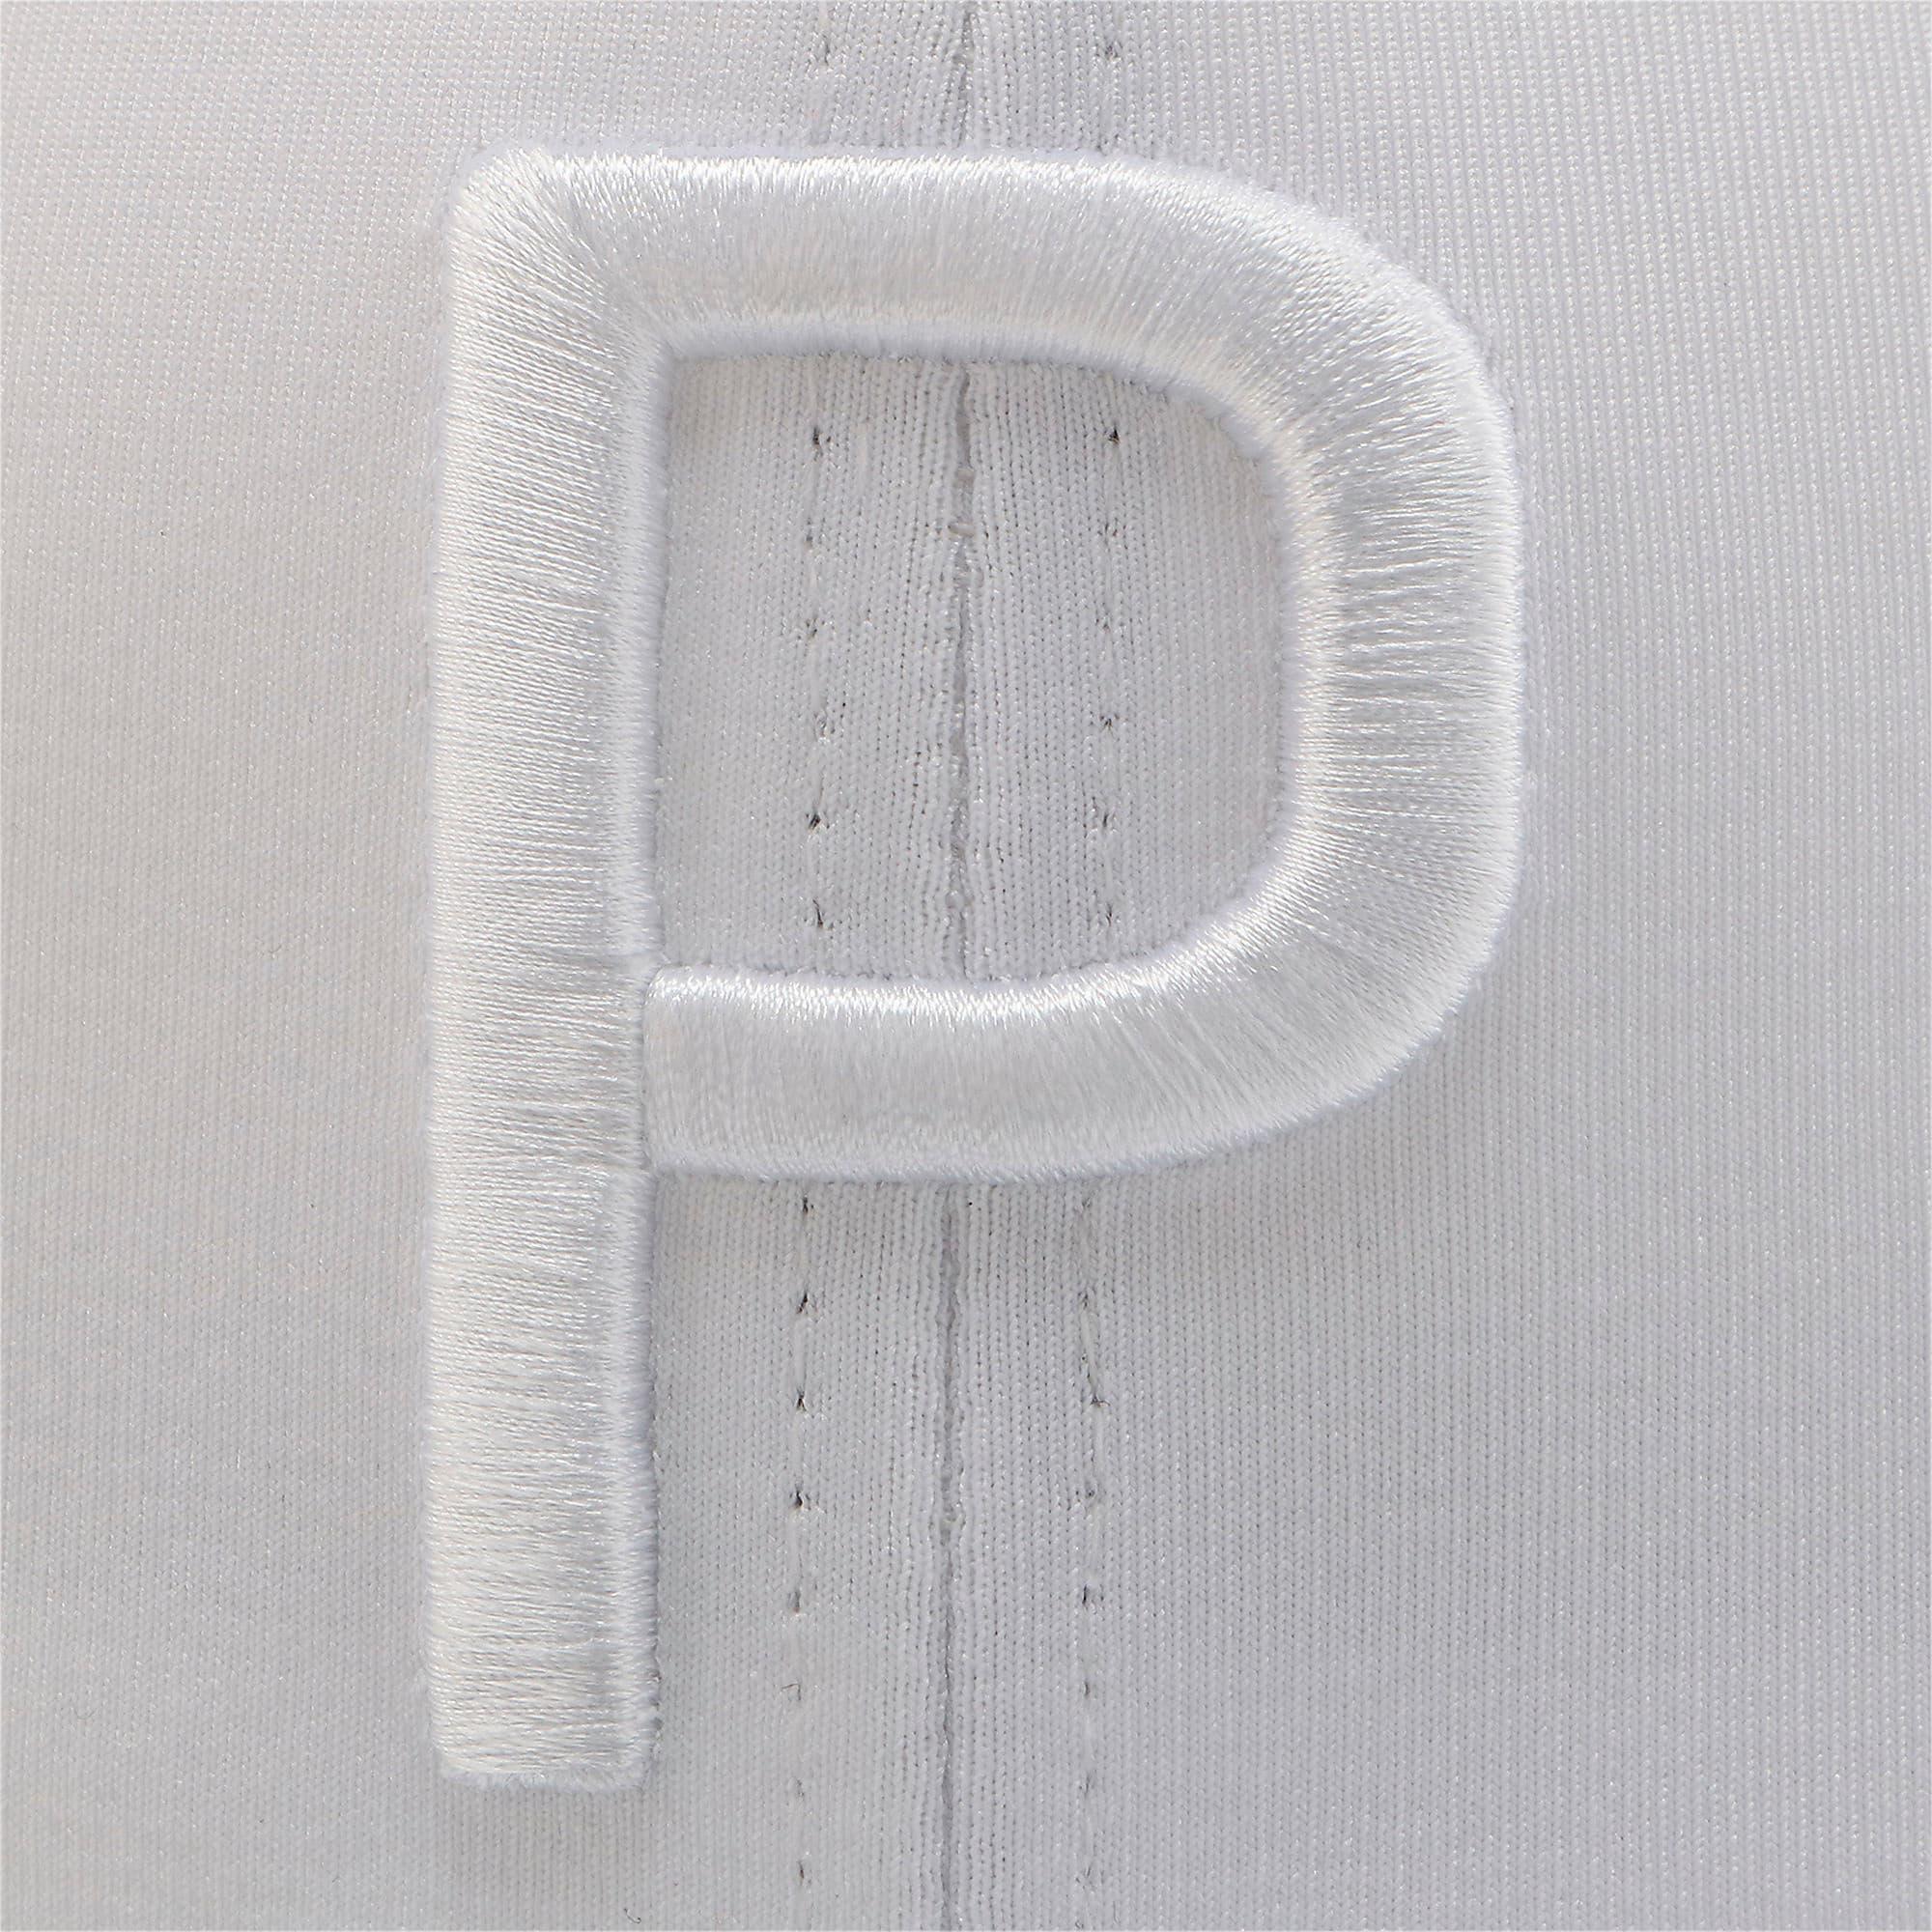 Thumbnail 5 of ゴルフ Pマークスナップバックキャップ, Bright White-Bright White, medium-JPN